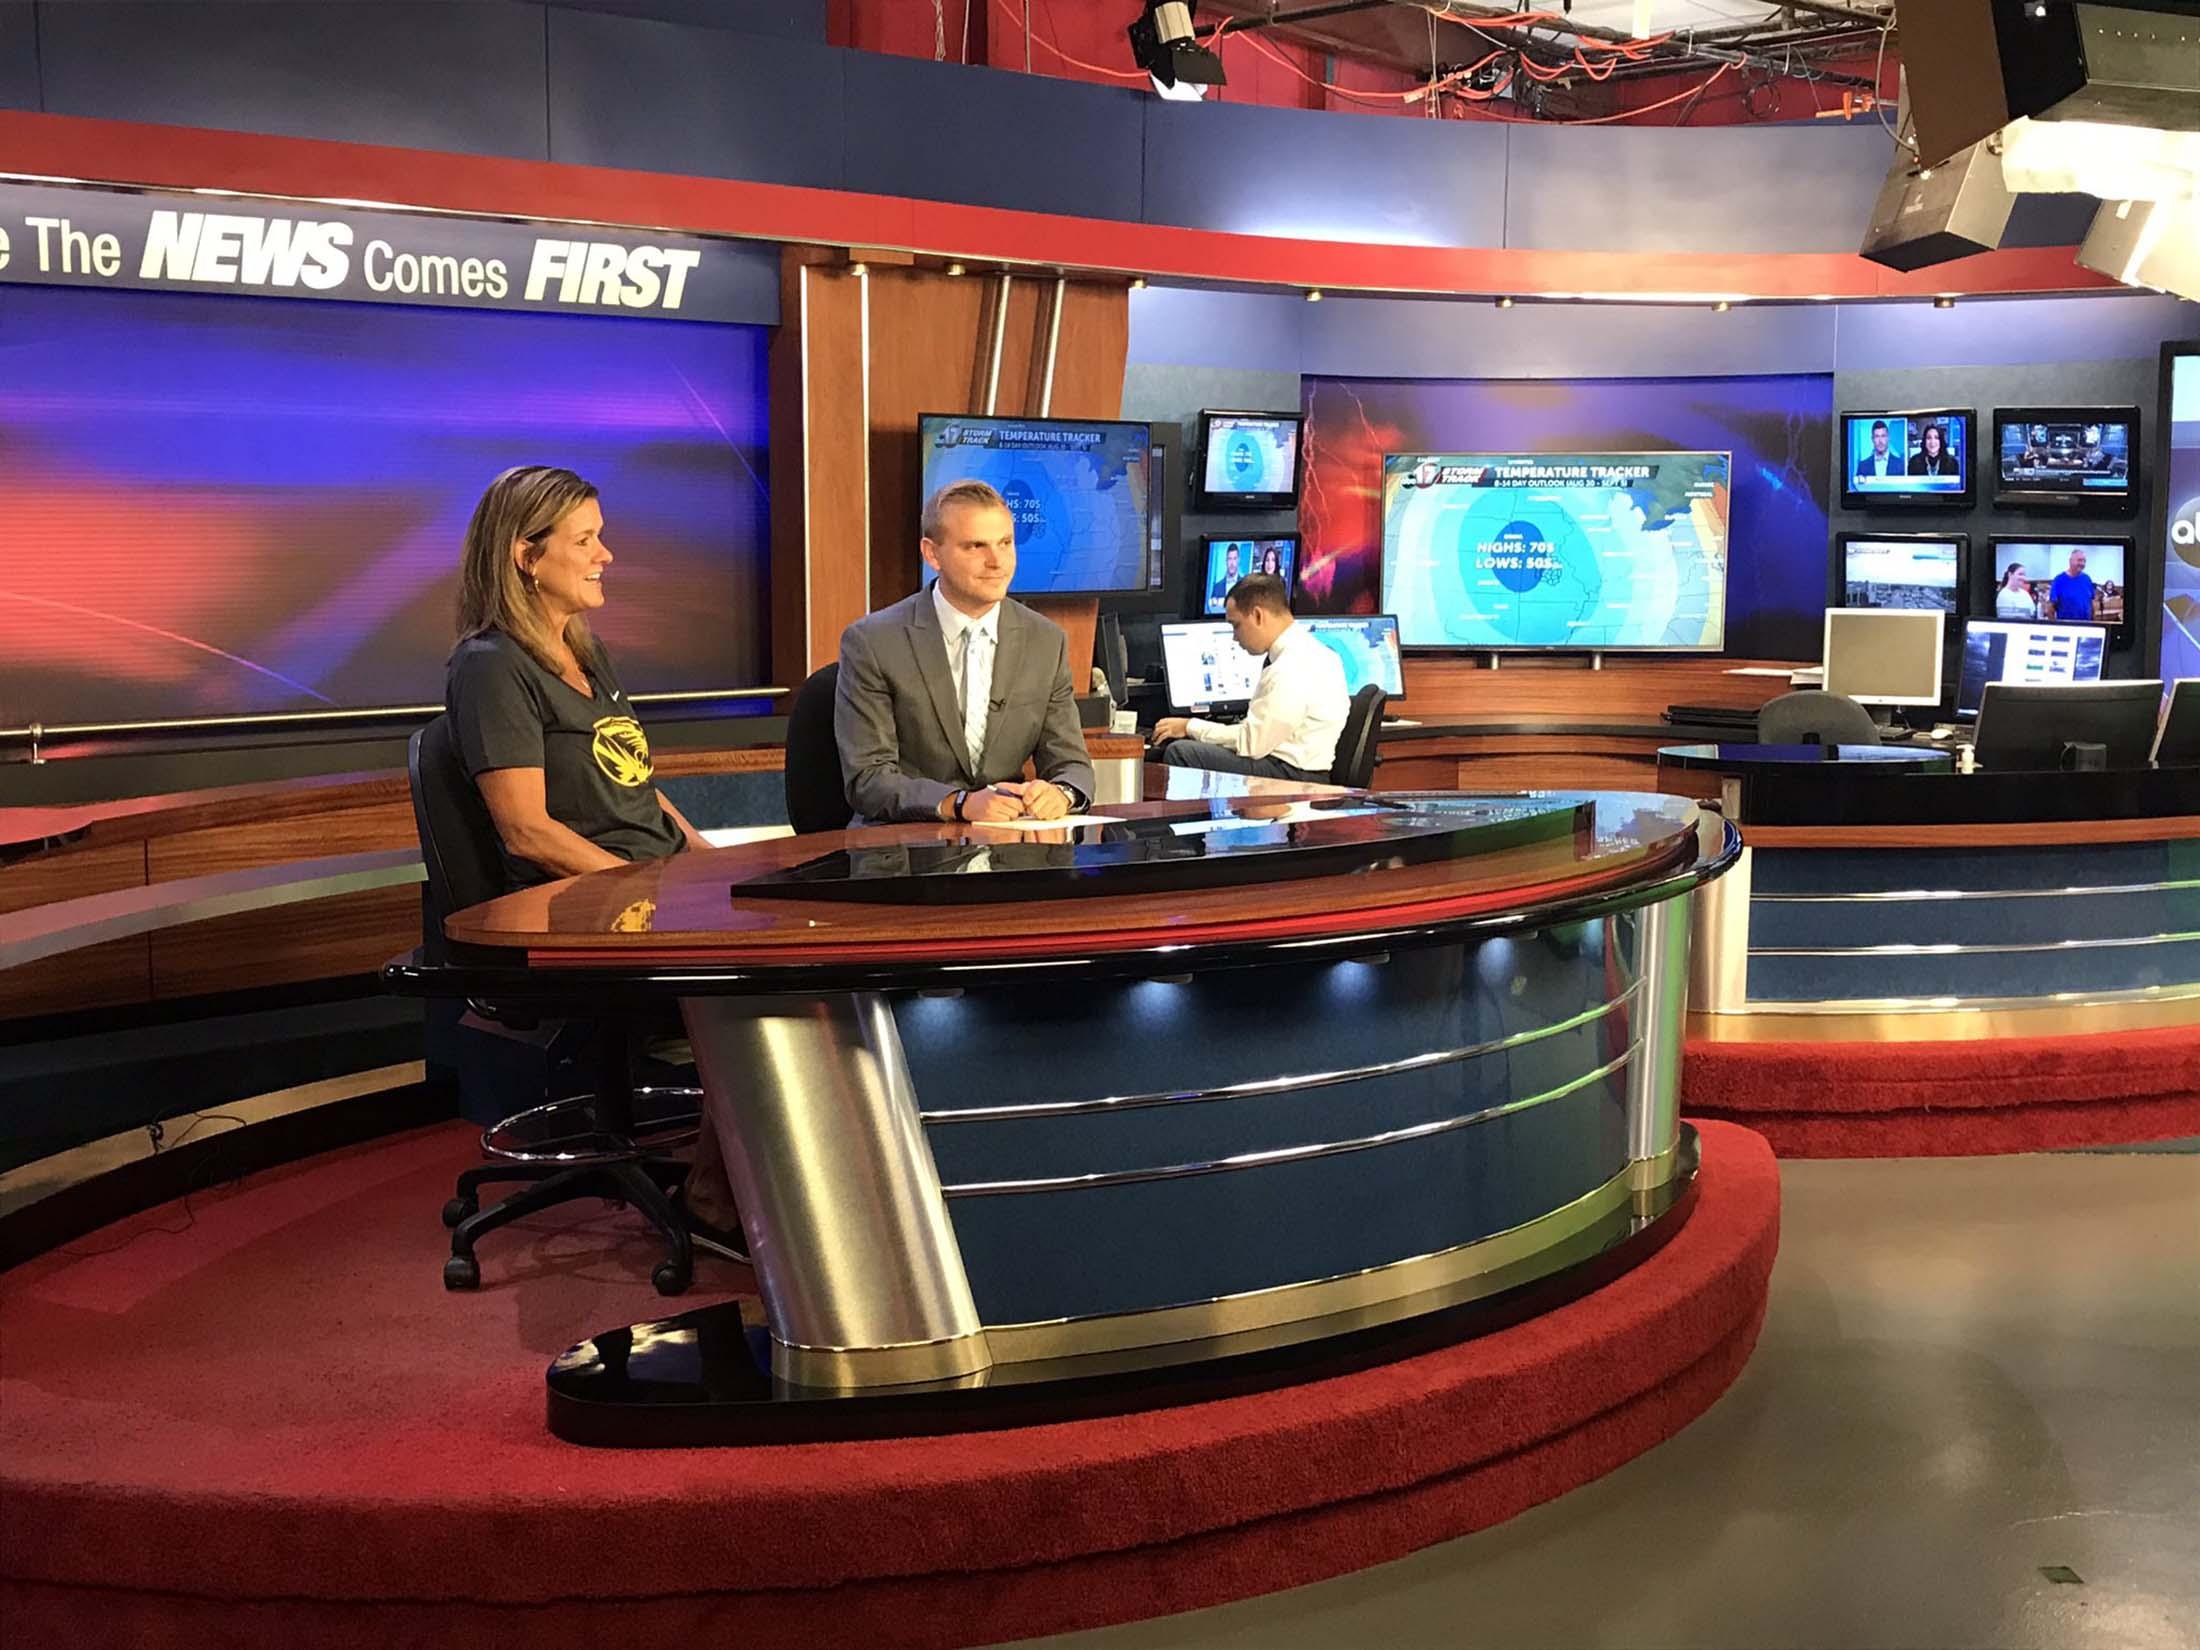 Robin Pingeton - Head Coach of University of Missouri at ABC 17